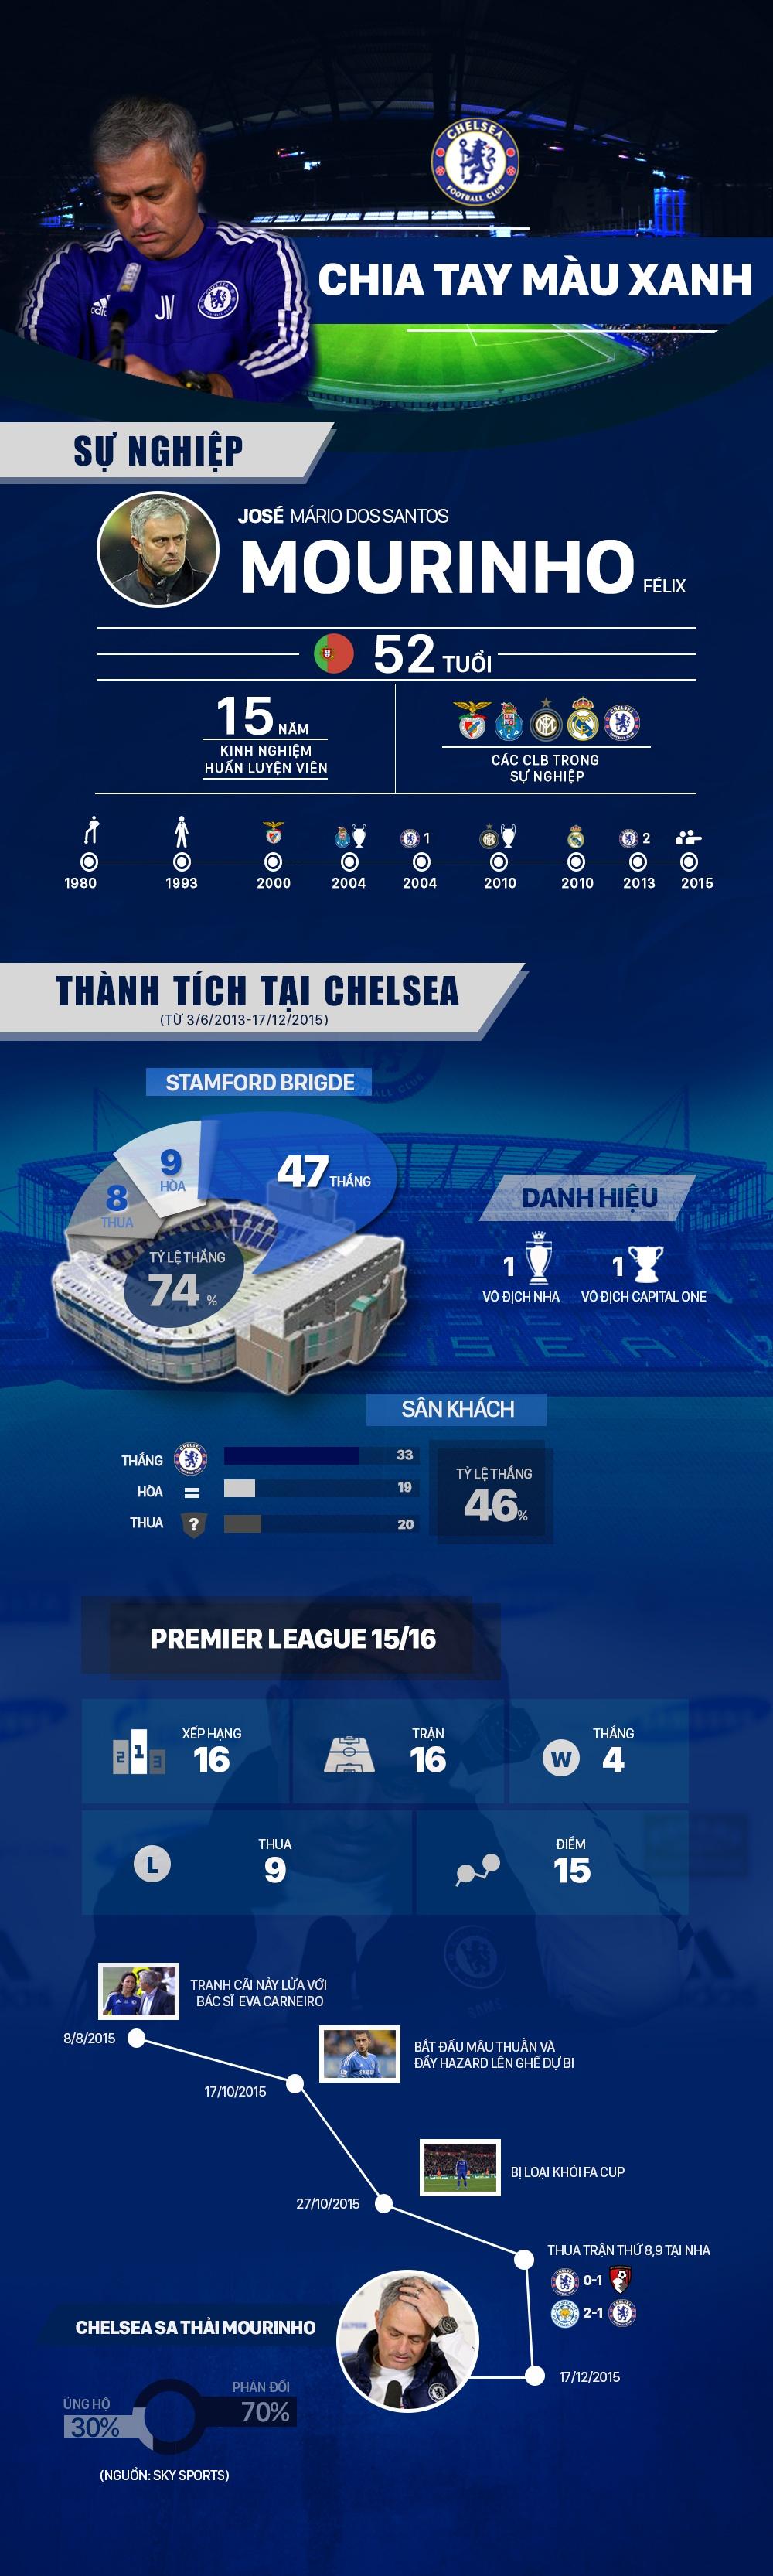 Nhung buoc ngoat khien Mourinho roi xa Chelsea hinh anh 1